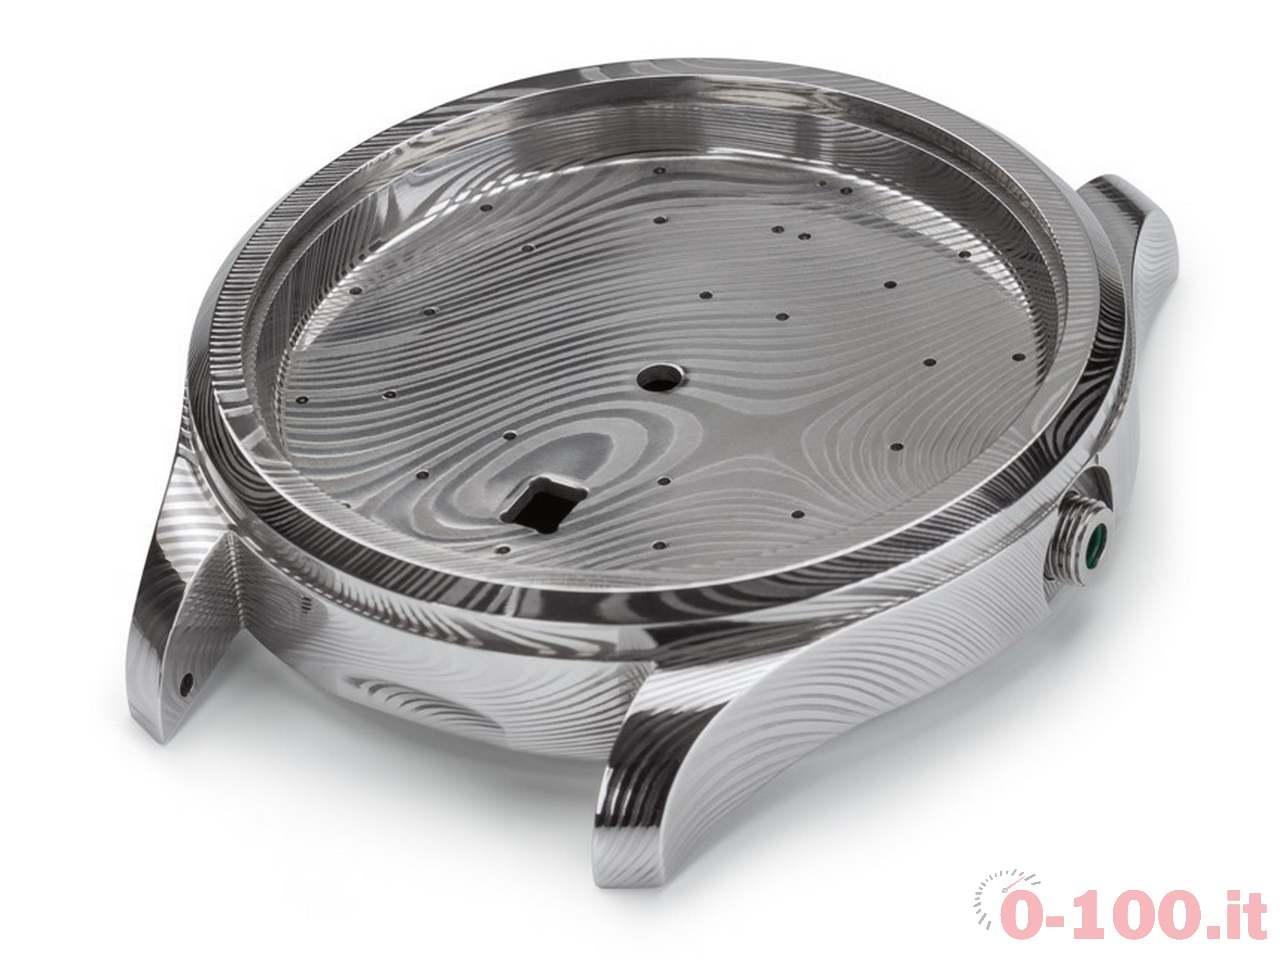 sinn-1800-s-damaszener-limited-edition-prezzo-price_0-1003